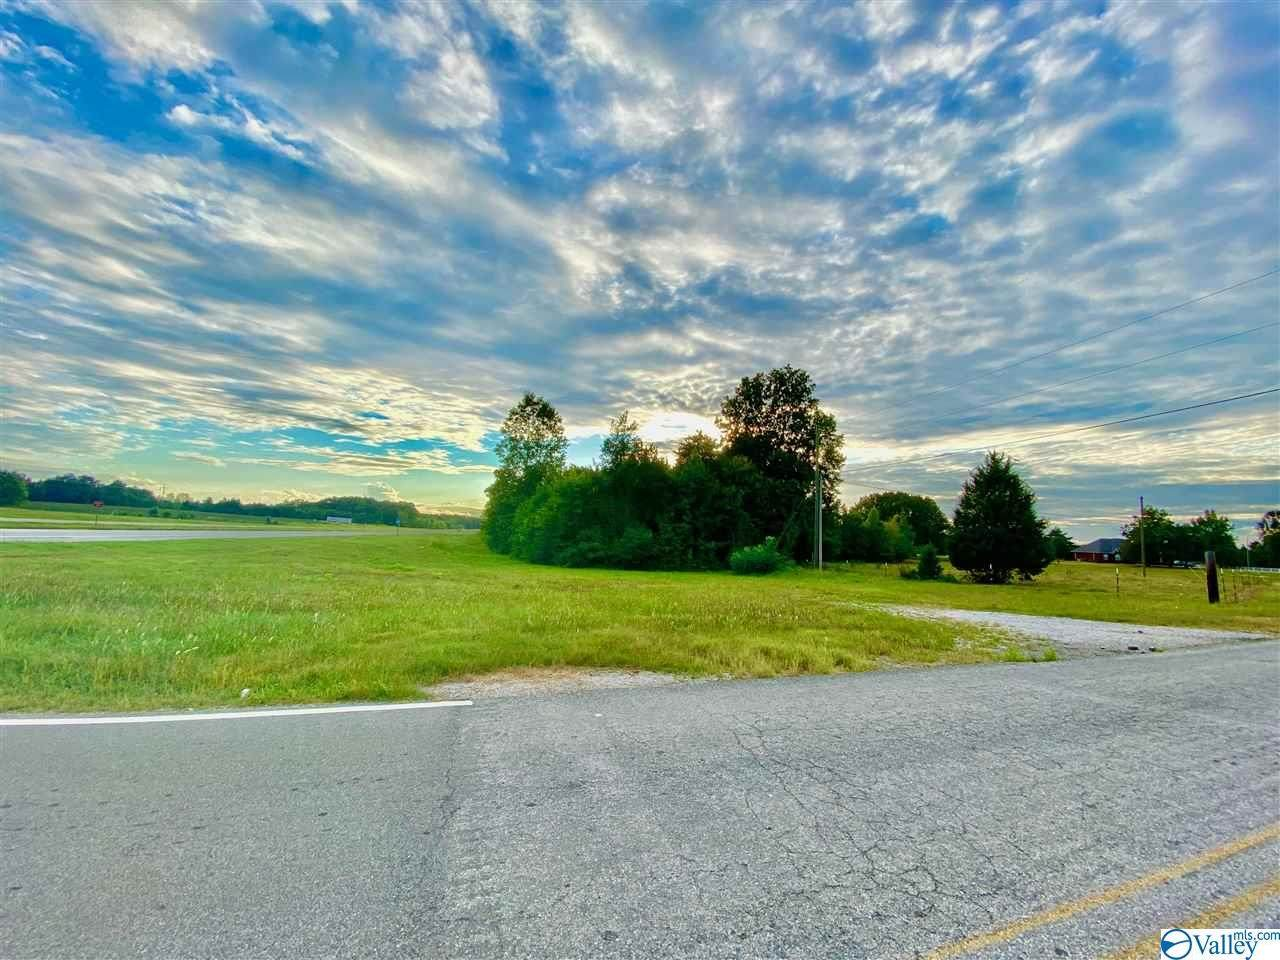 000 Alabama Highway 24 - Photo 1